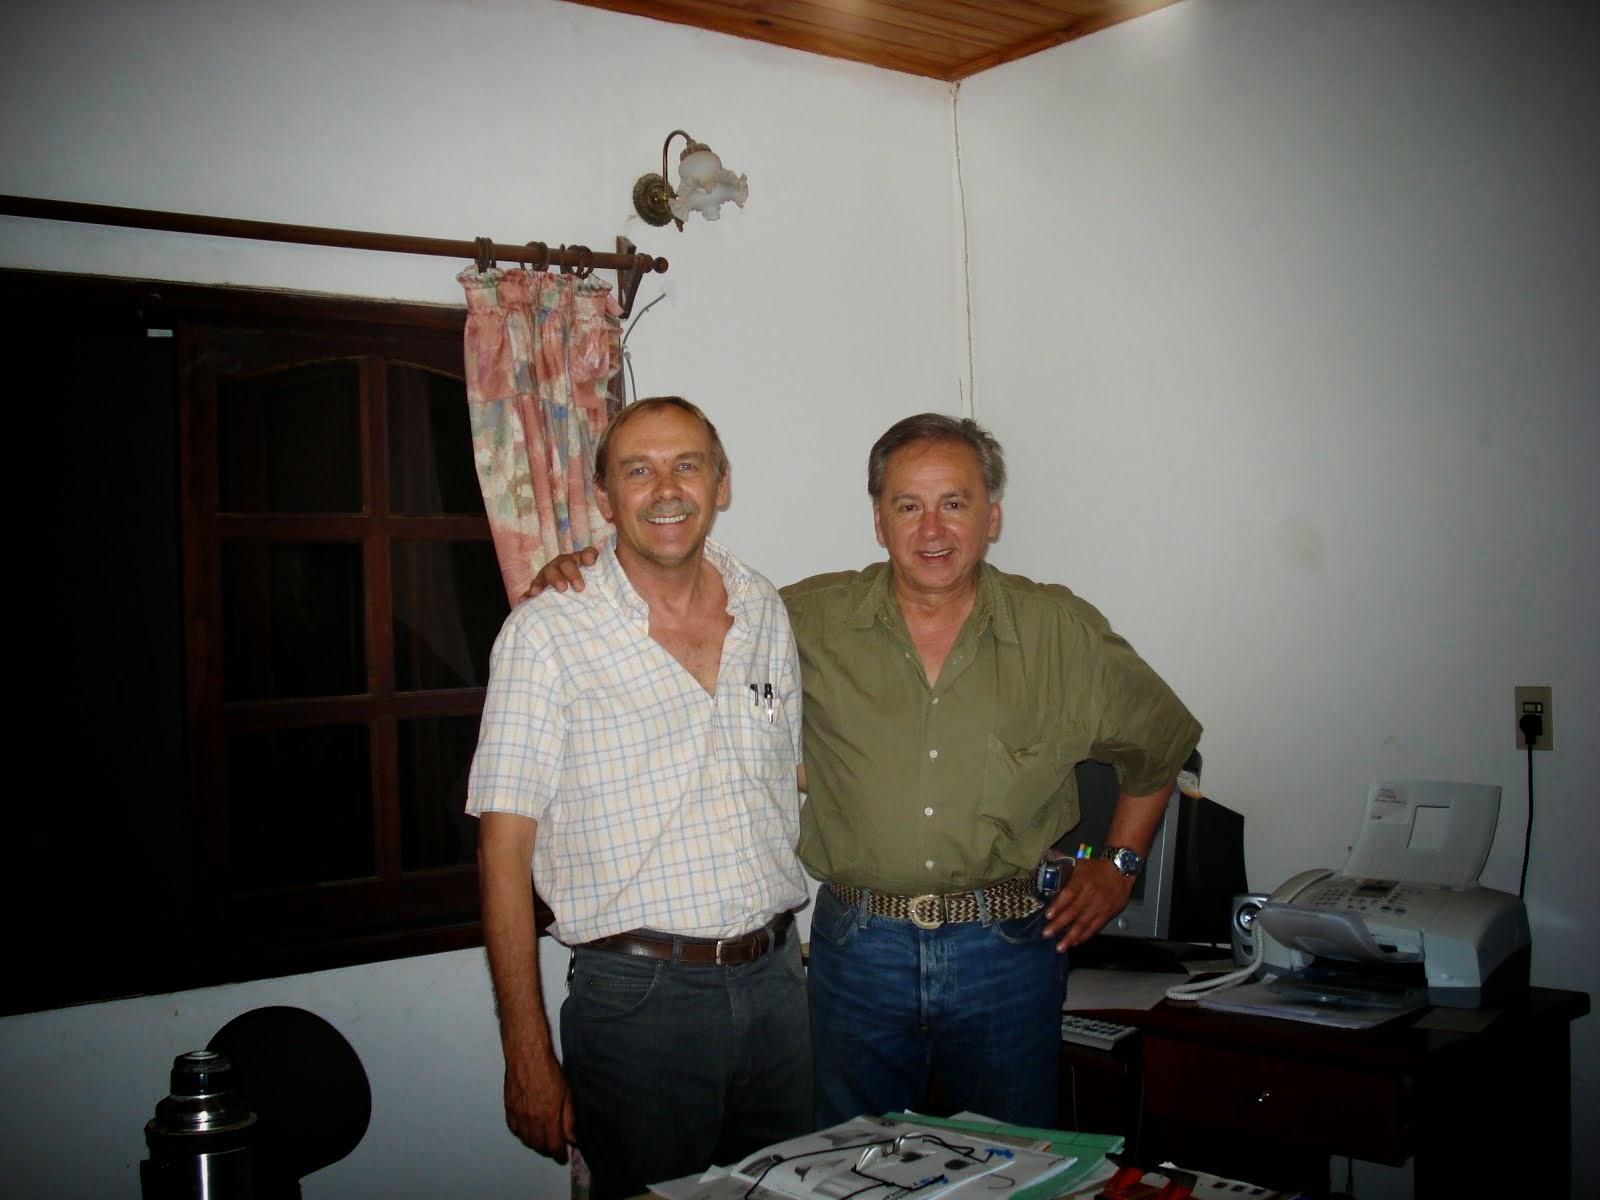 Pablo Onocko